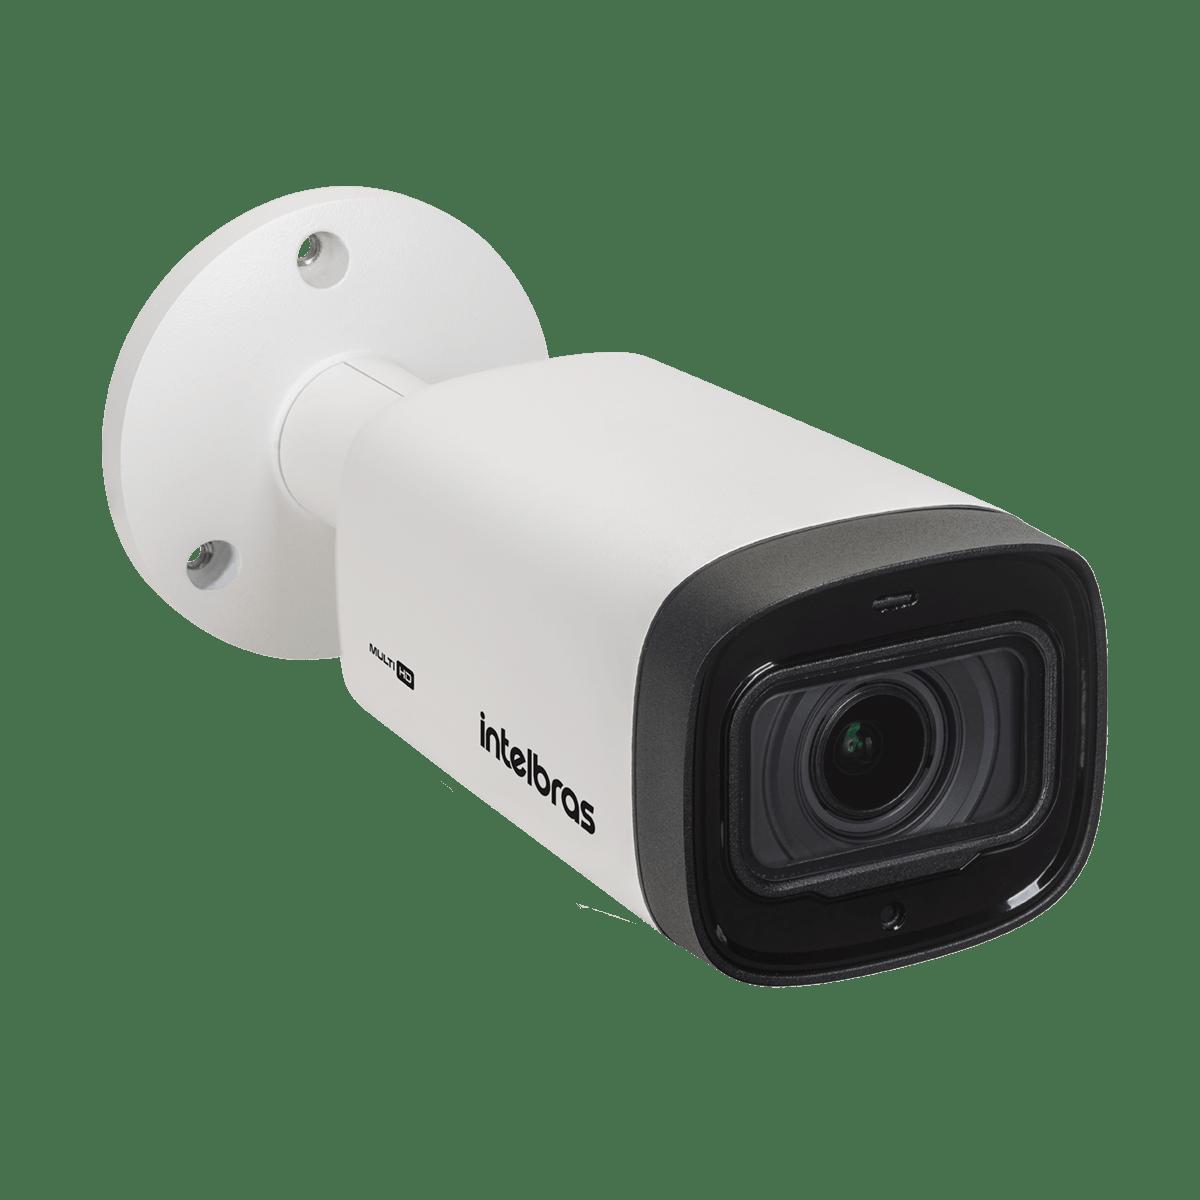 Câmera Intelbras Varifocal com Zoom Multi HD 3140VF G5 Alta Definição (1.0MP | 720p | 2.7mm~13.5mm | Metal)  - CFTV Clube | Brasil